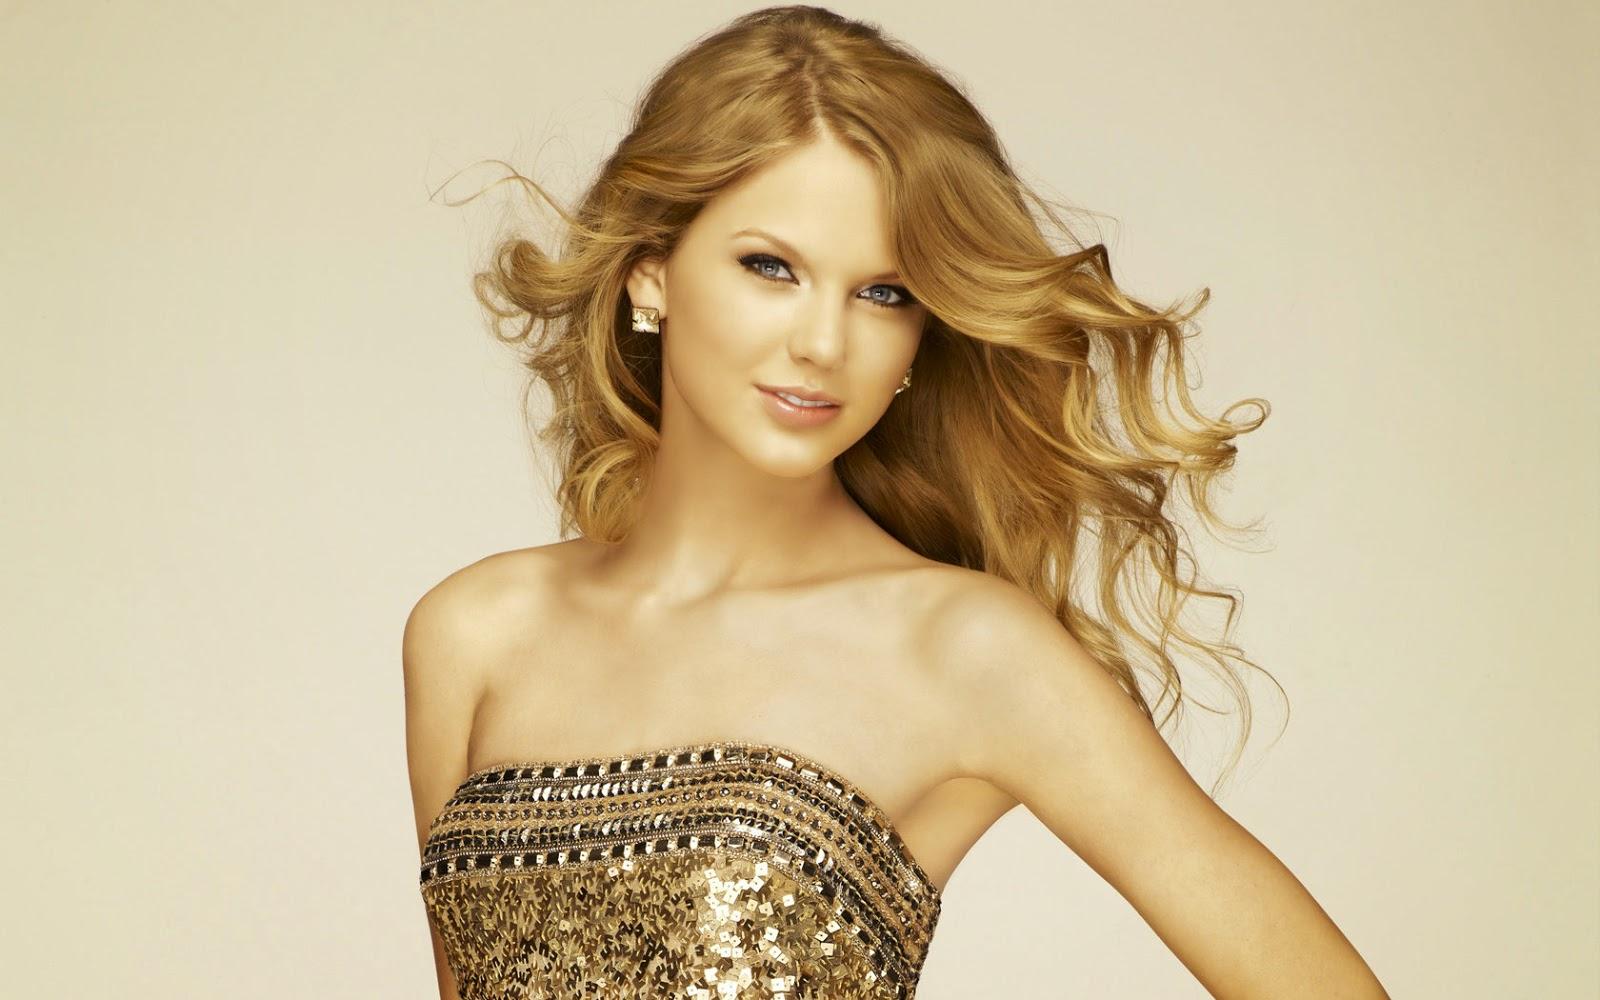 Katrina Kaif Cute Face Hd Wallpapers Coogled Taylor Swift Cute Hd Wallpapers